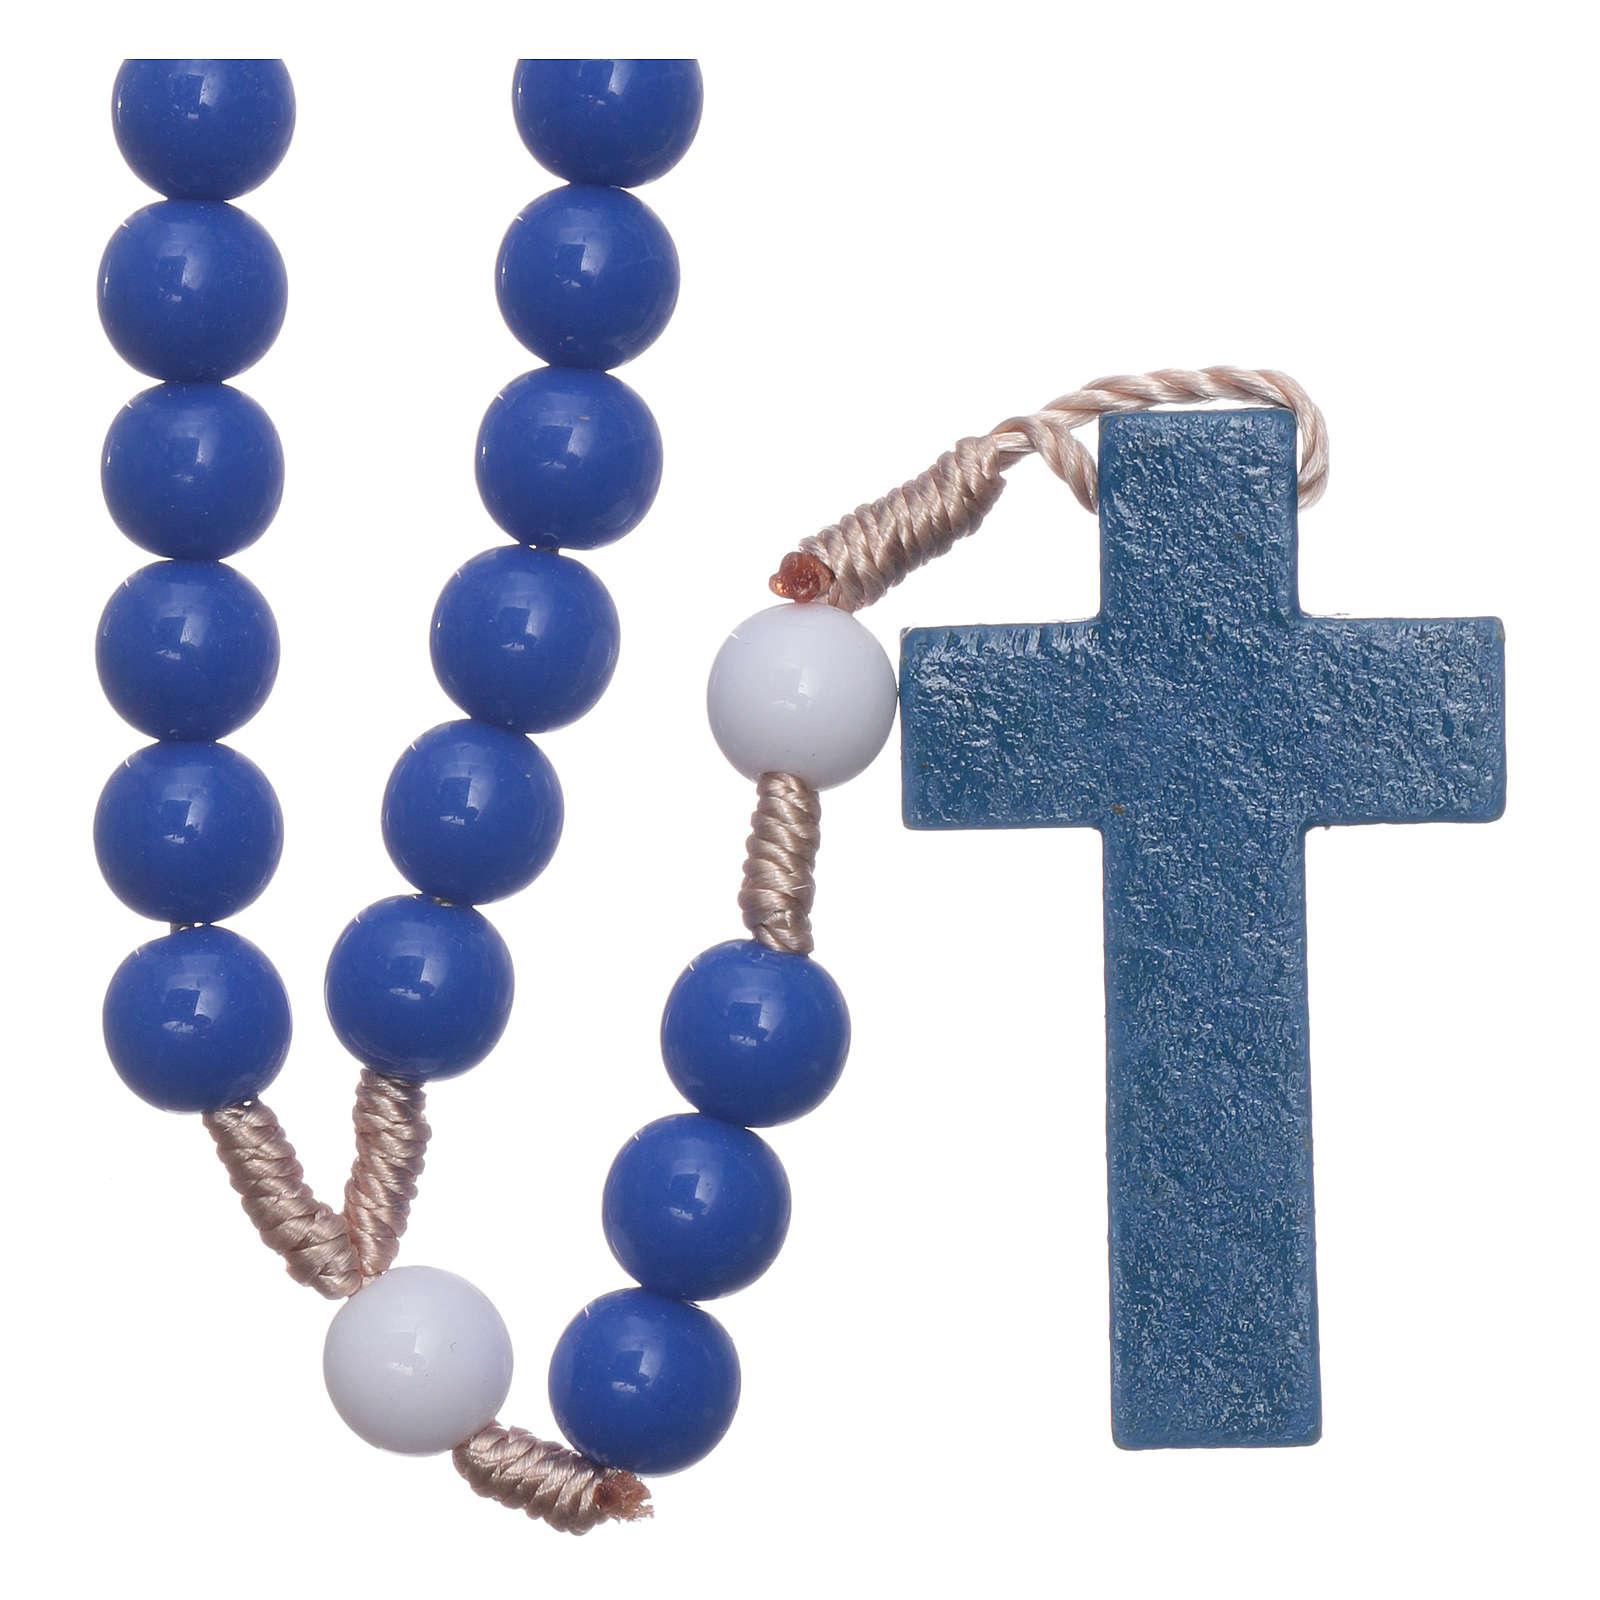 Rosario in plastica grani blu e pater bianchi legatura seta 7,5 mm 4